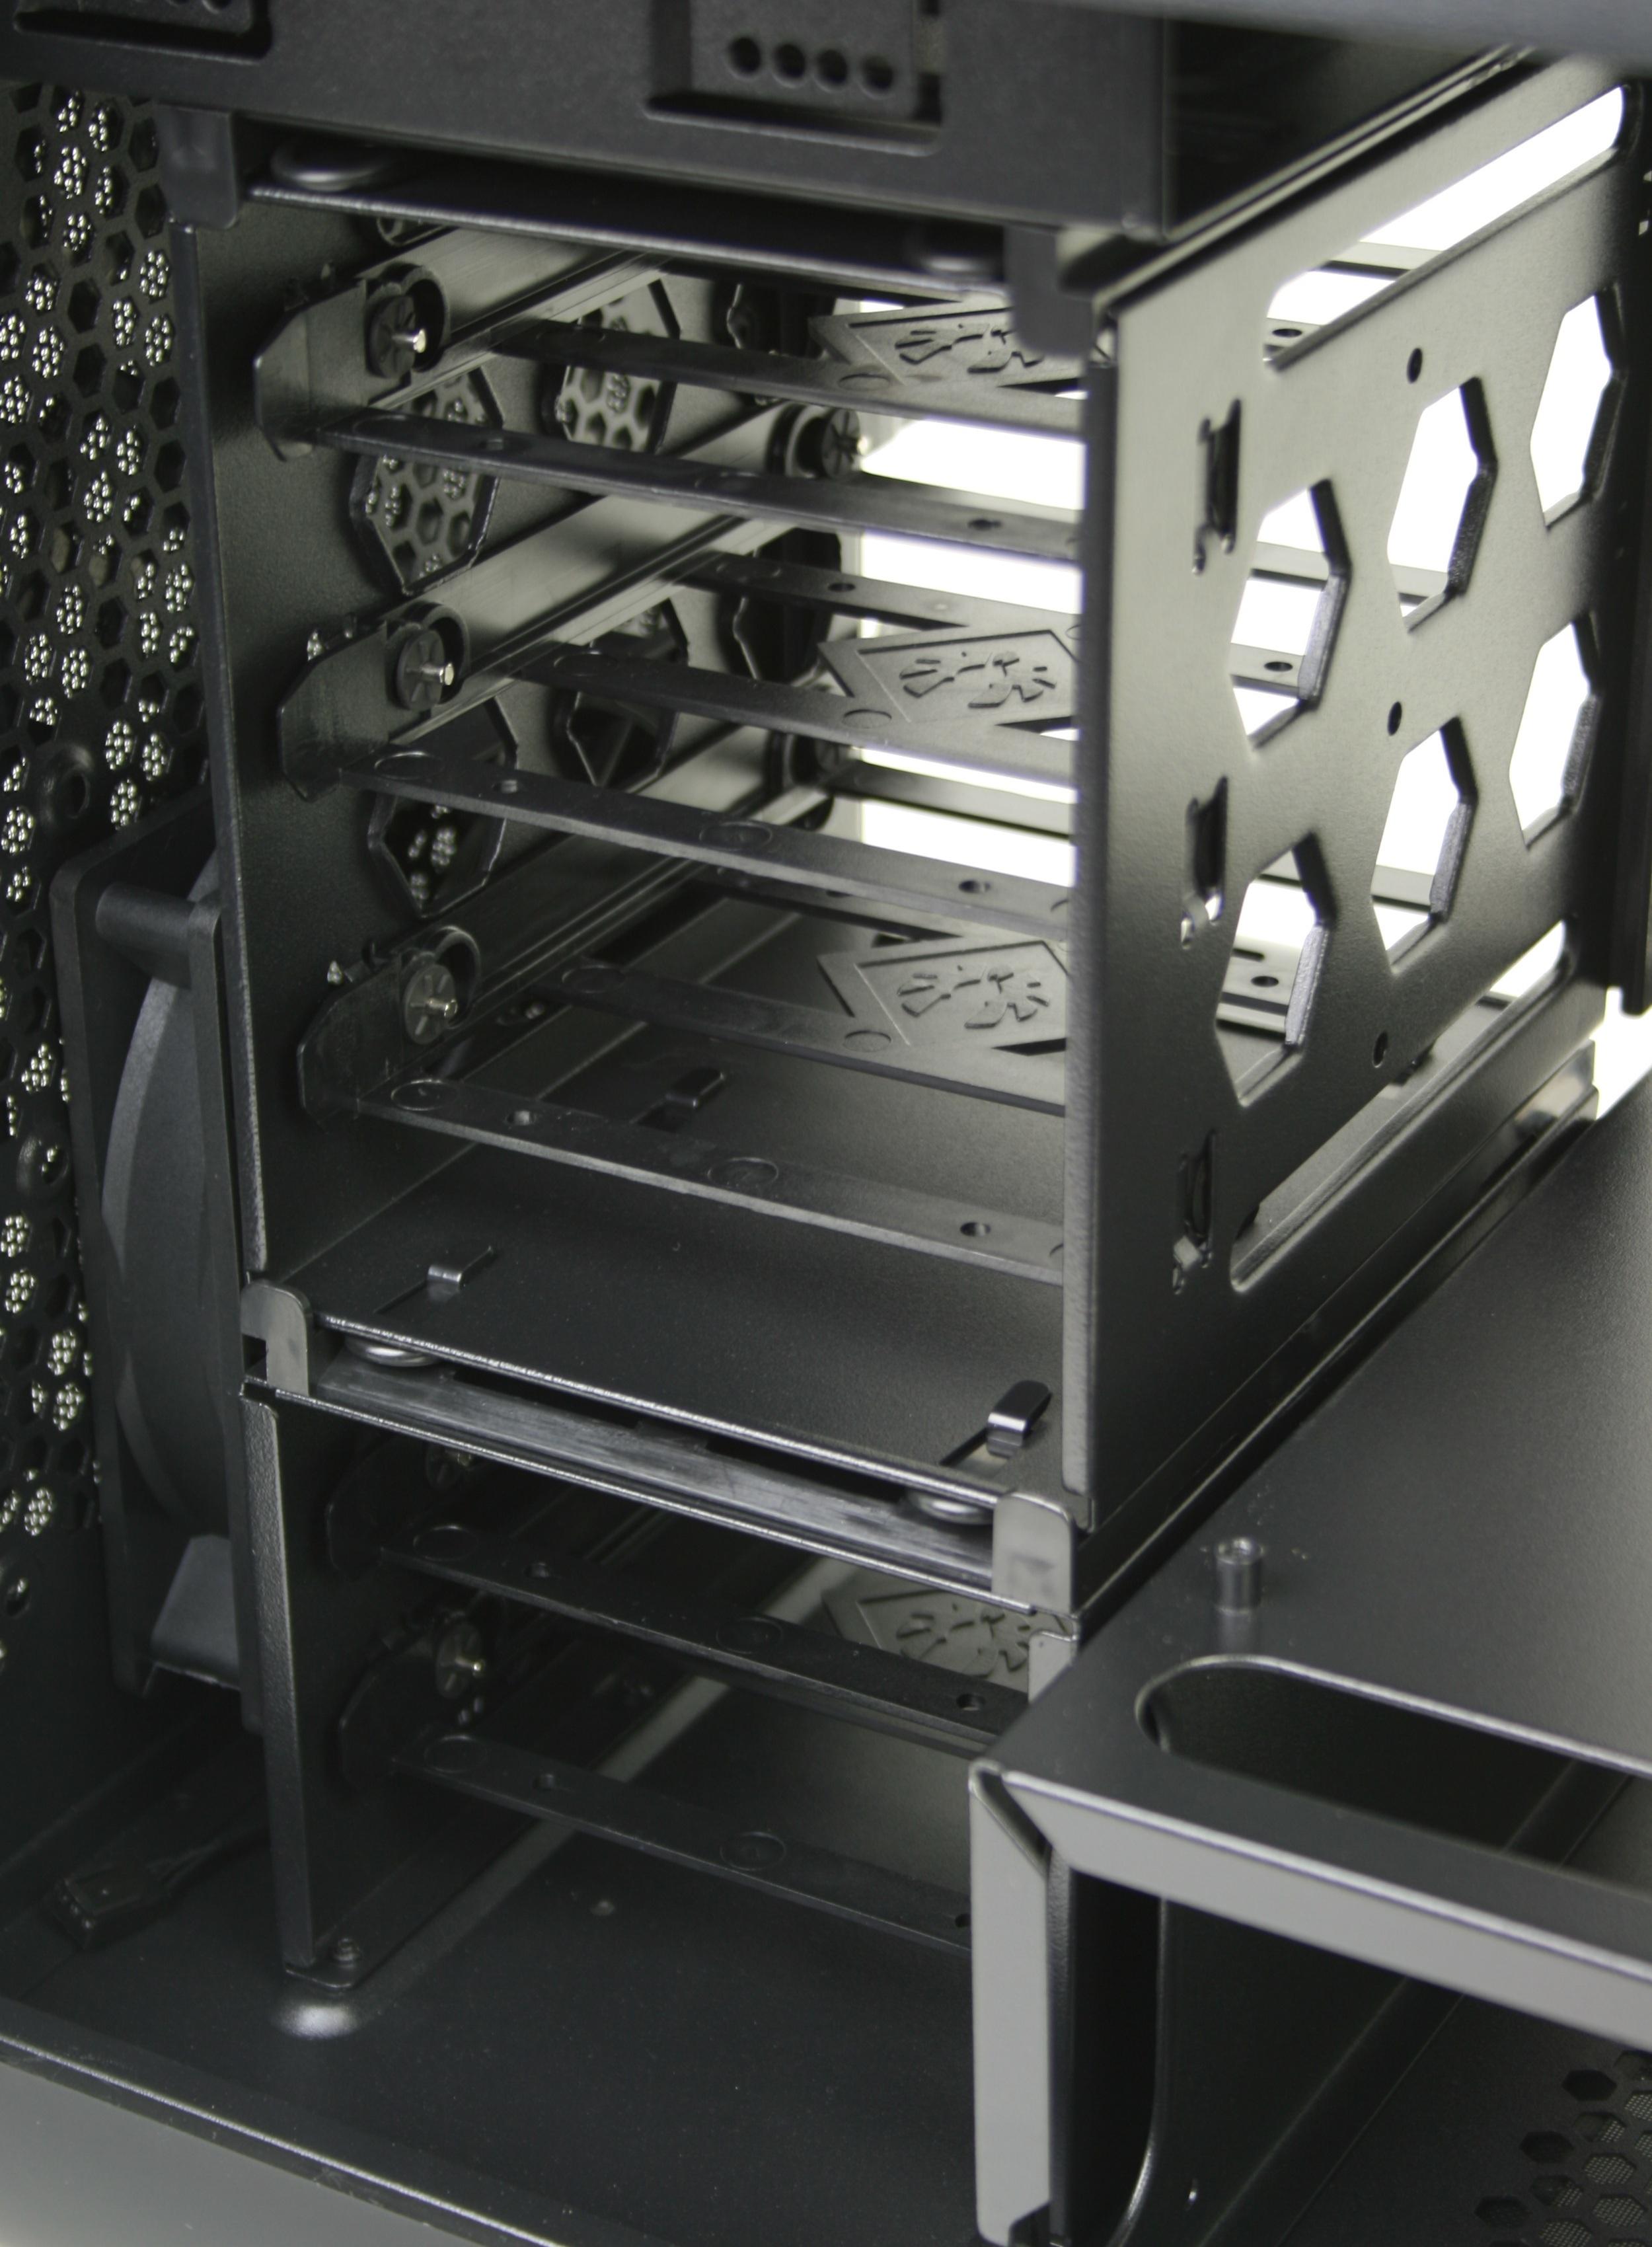 BitFenix Prodigy 3.5 inch Drive Cage Rear